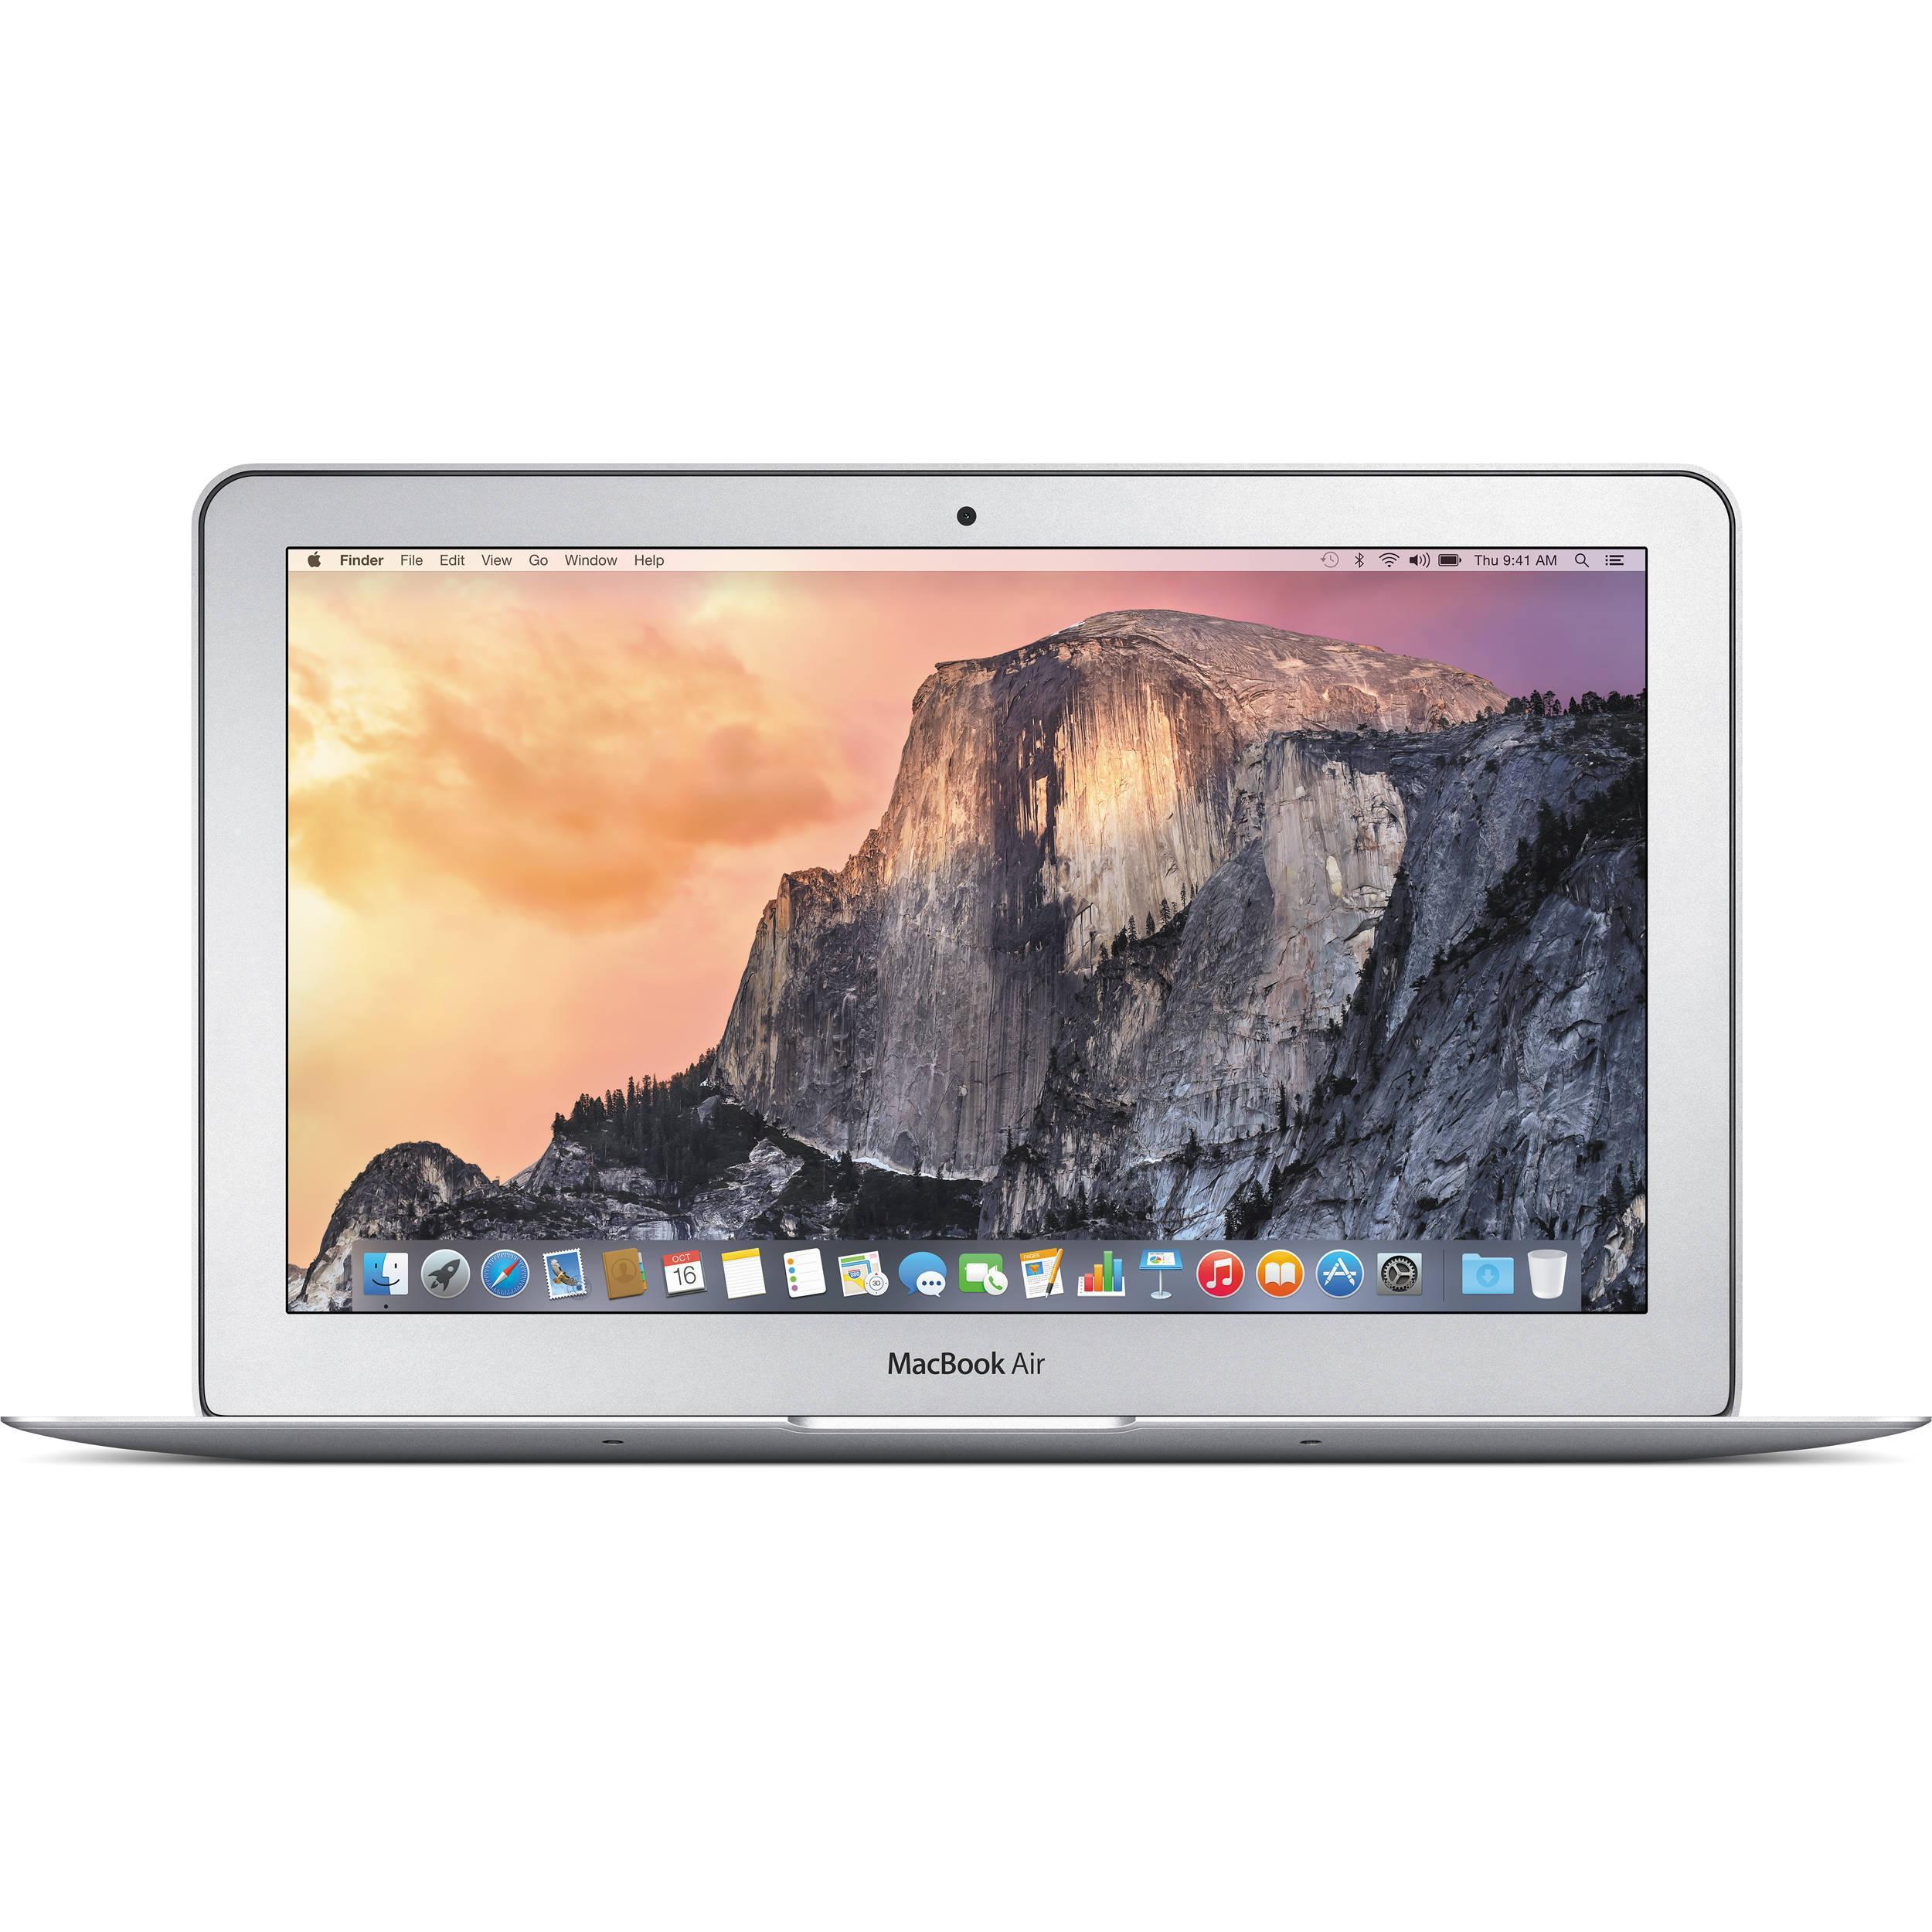 "MacBook Air 11"" (2010) - Core 2 Duo 1,4 GHz - SSD 128 GB - 2GB - QWERTY - Spanisch"